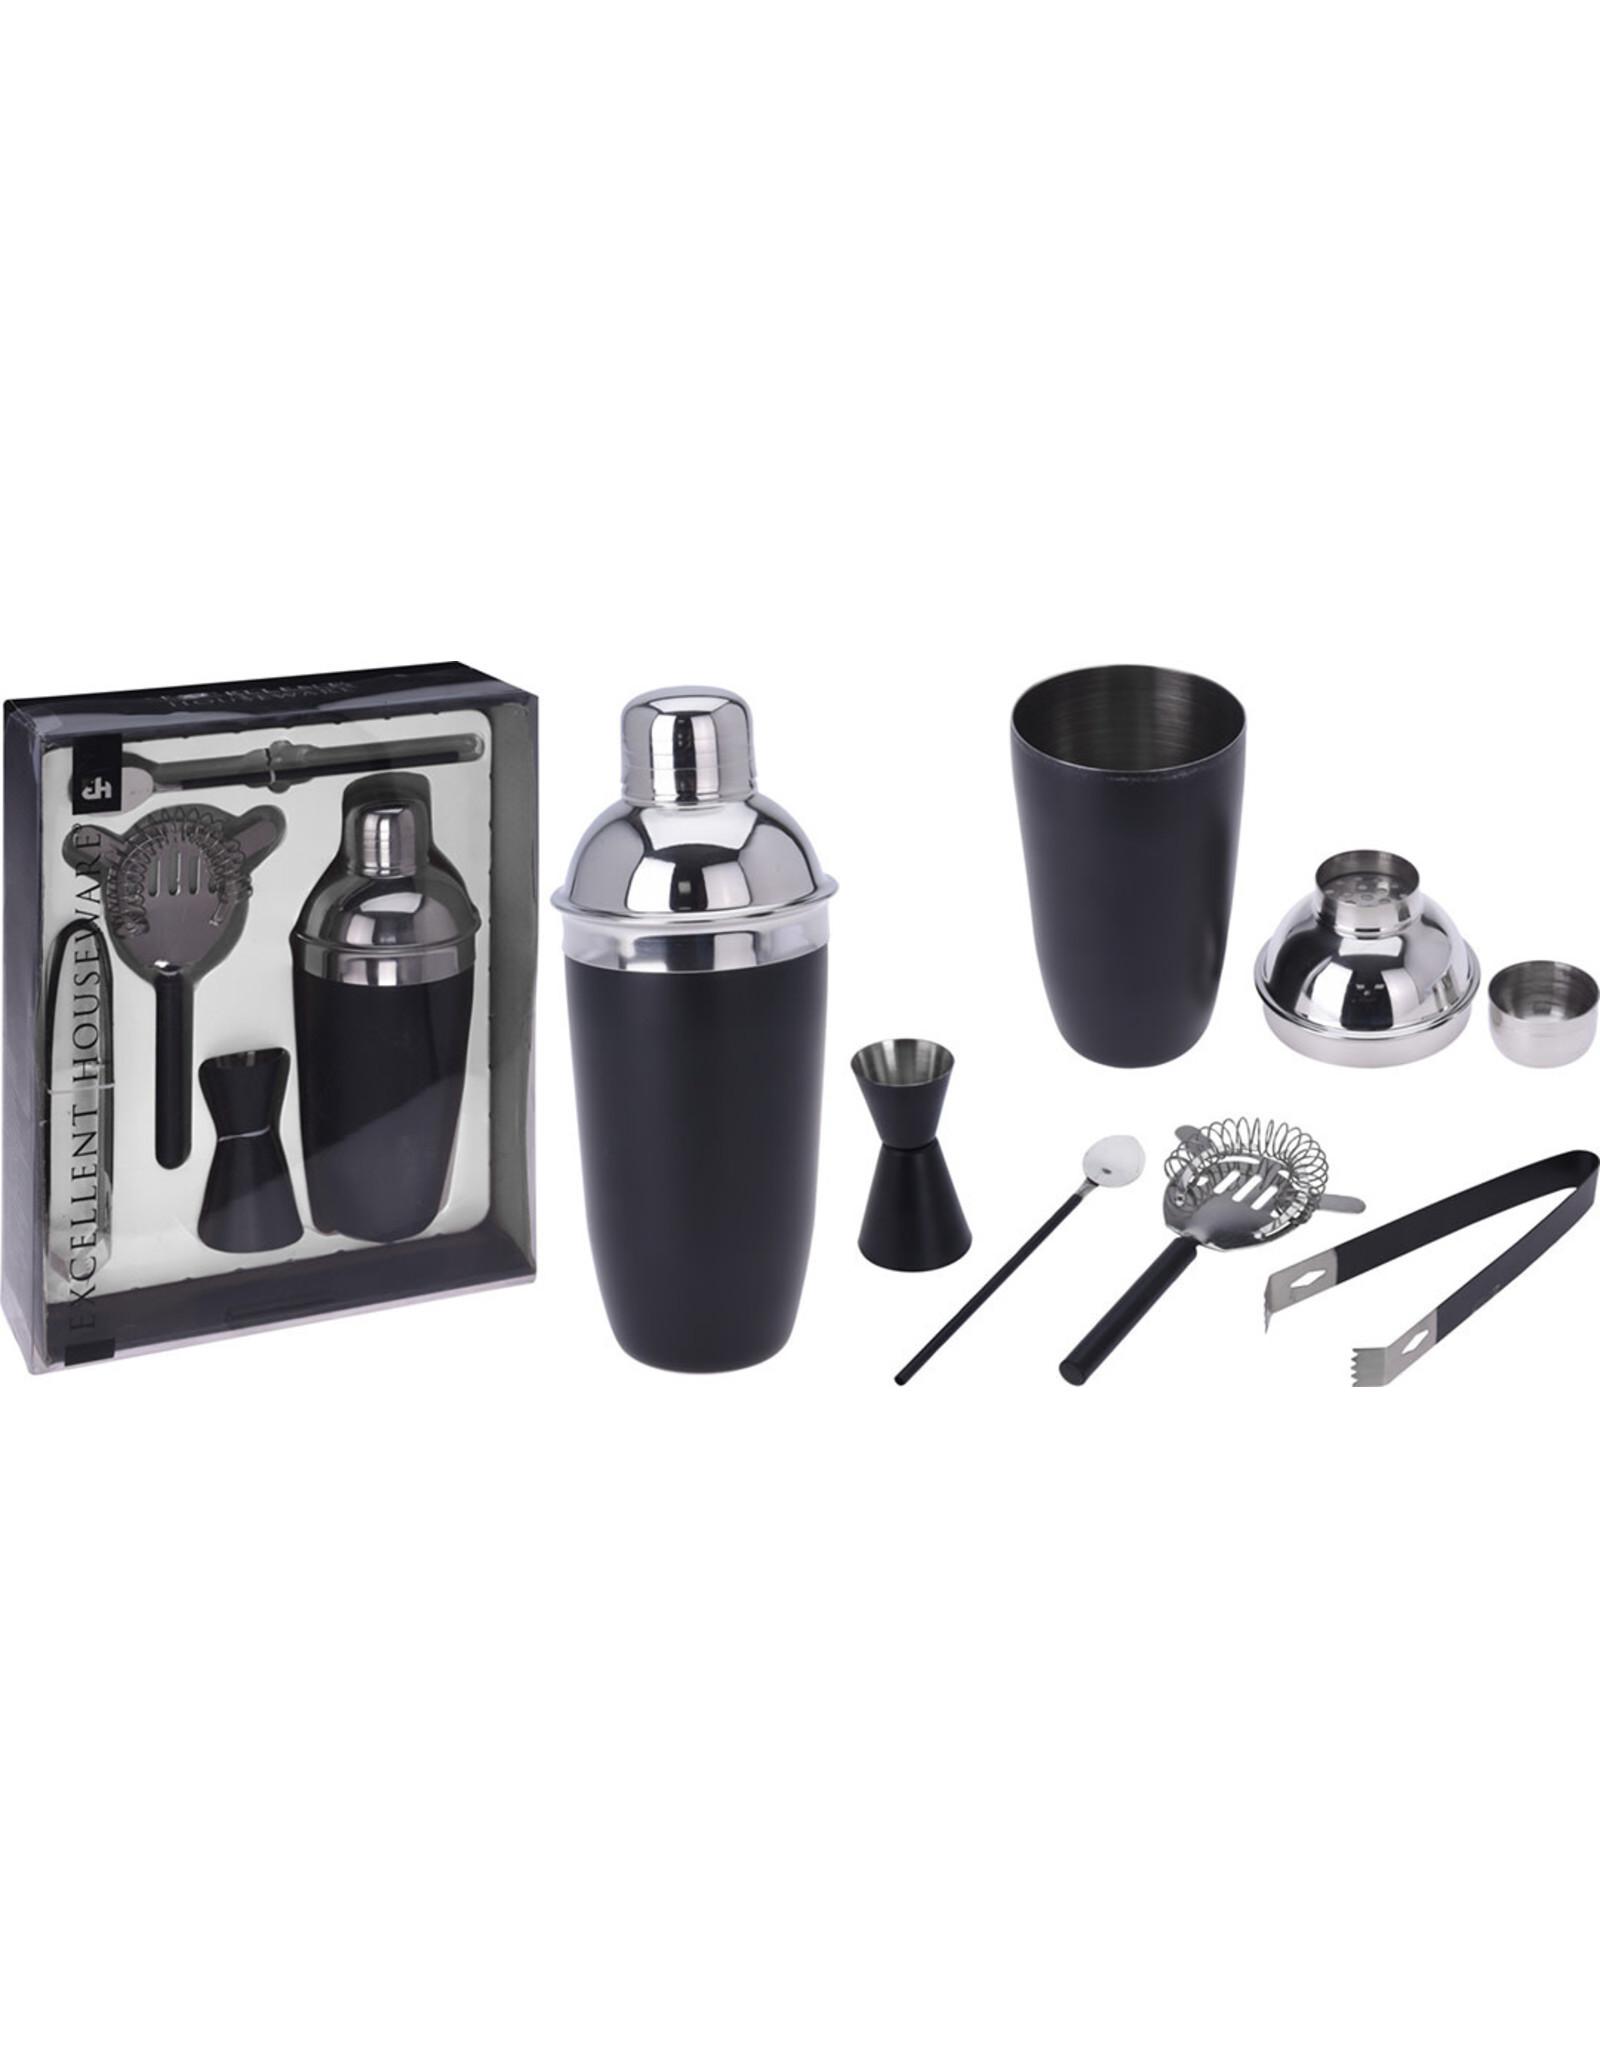 Koopman Cocktail Shaker Set 5Pcs